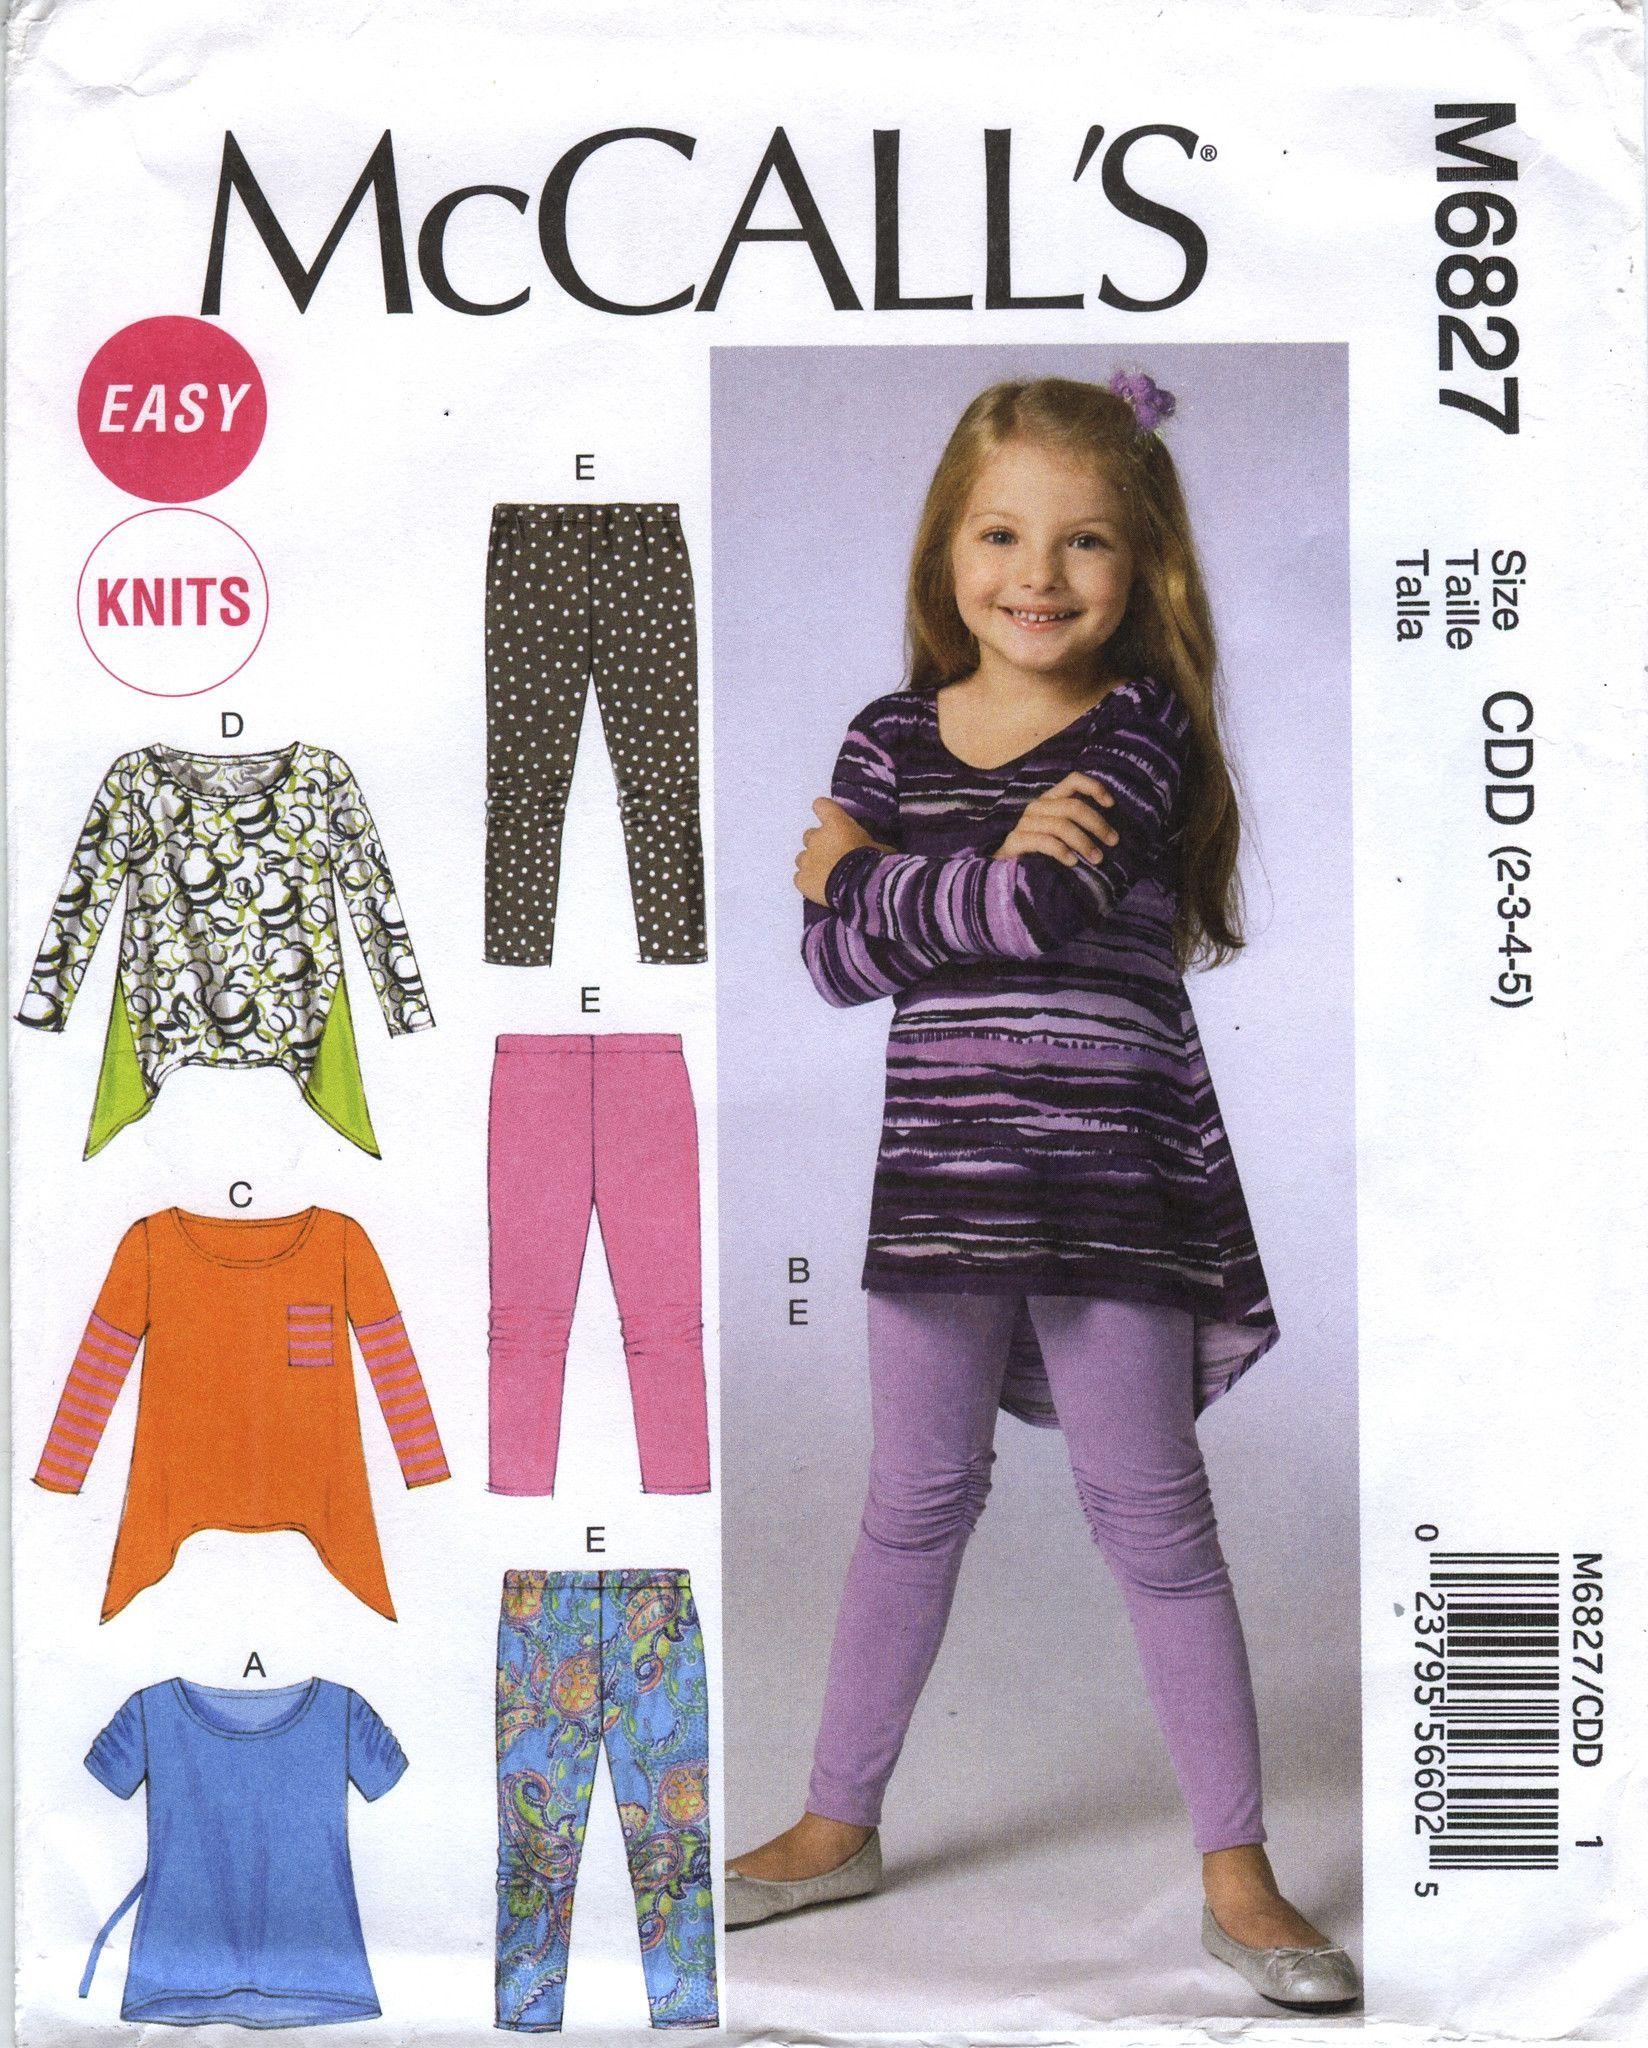 c63277015ece5 McCall s 6827 Children s Girls  Tops and Leggings